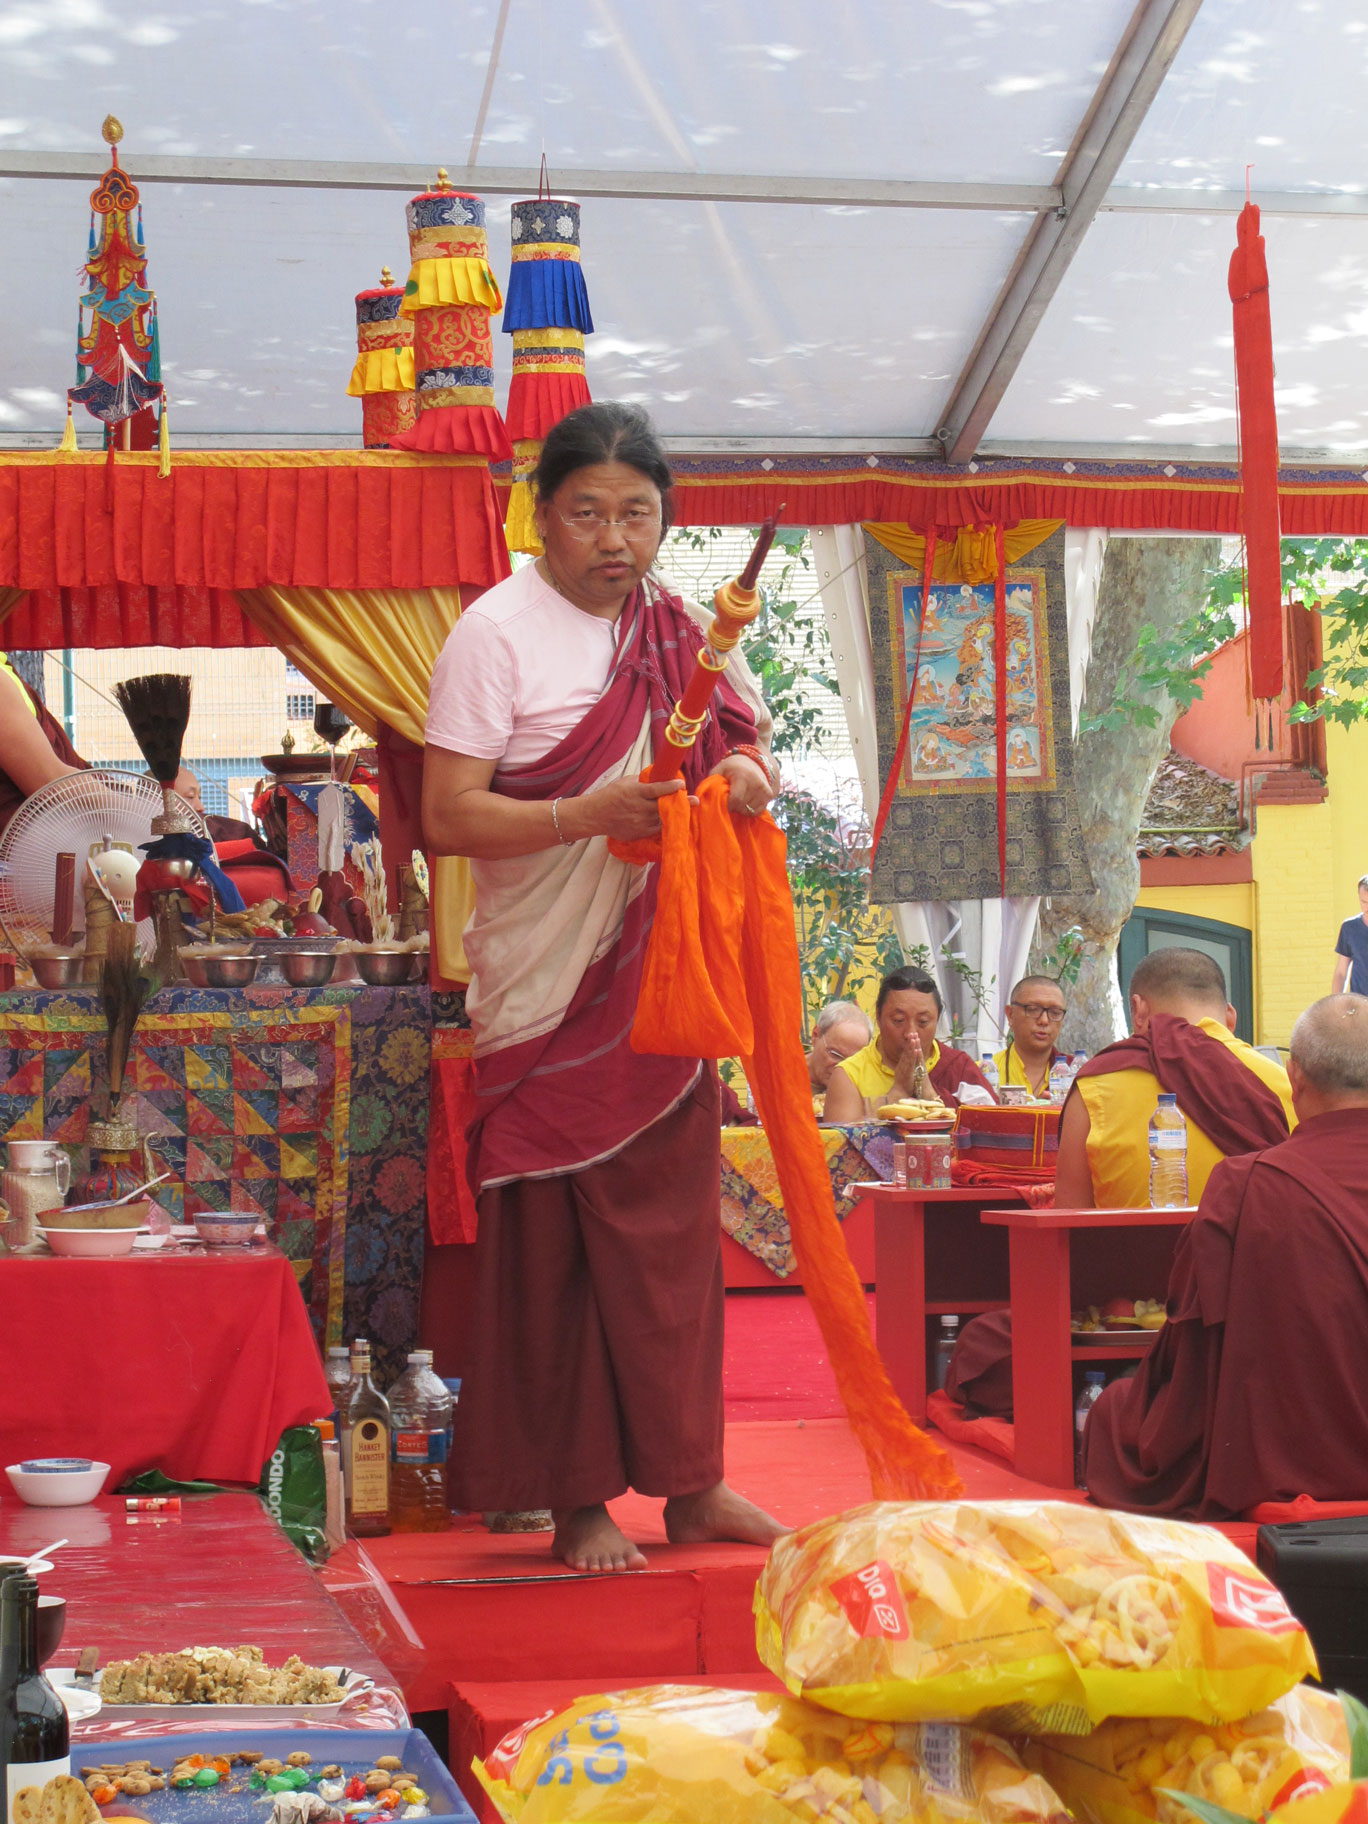 SS-Dudjom-Rinpoche-Sangye-Pema-Zhepa-evento-valencia-julio-2019-02